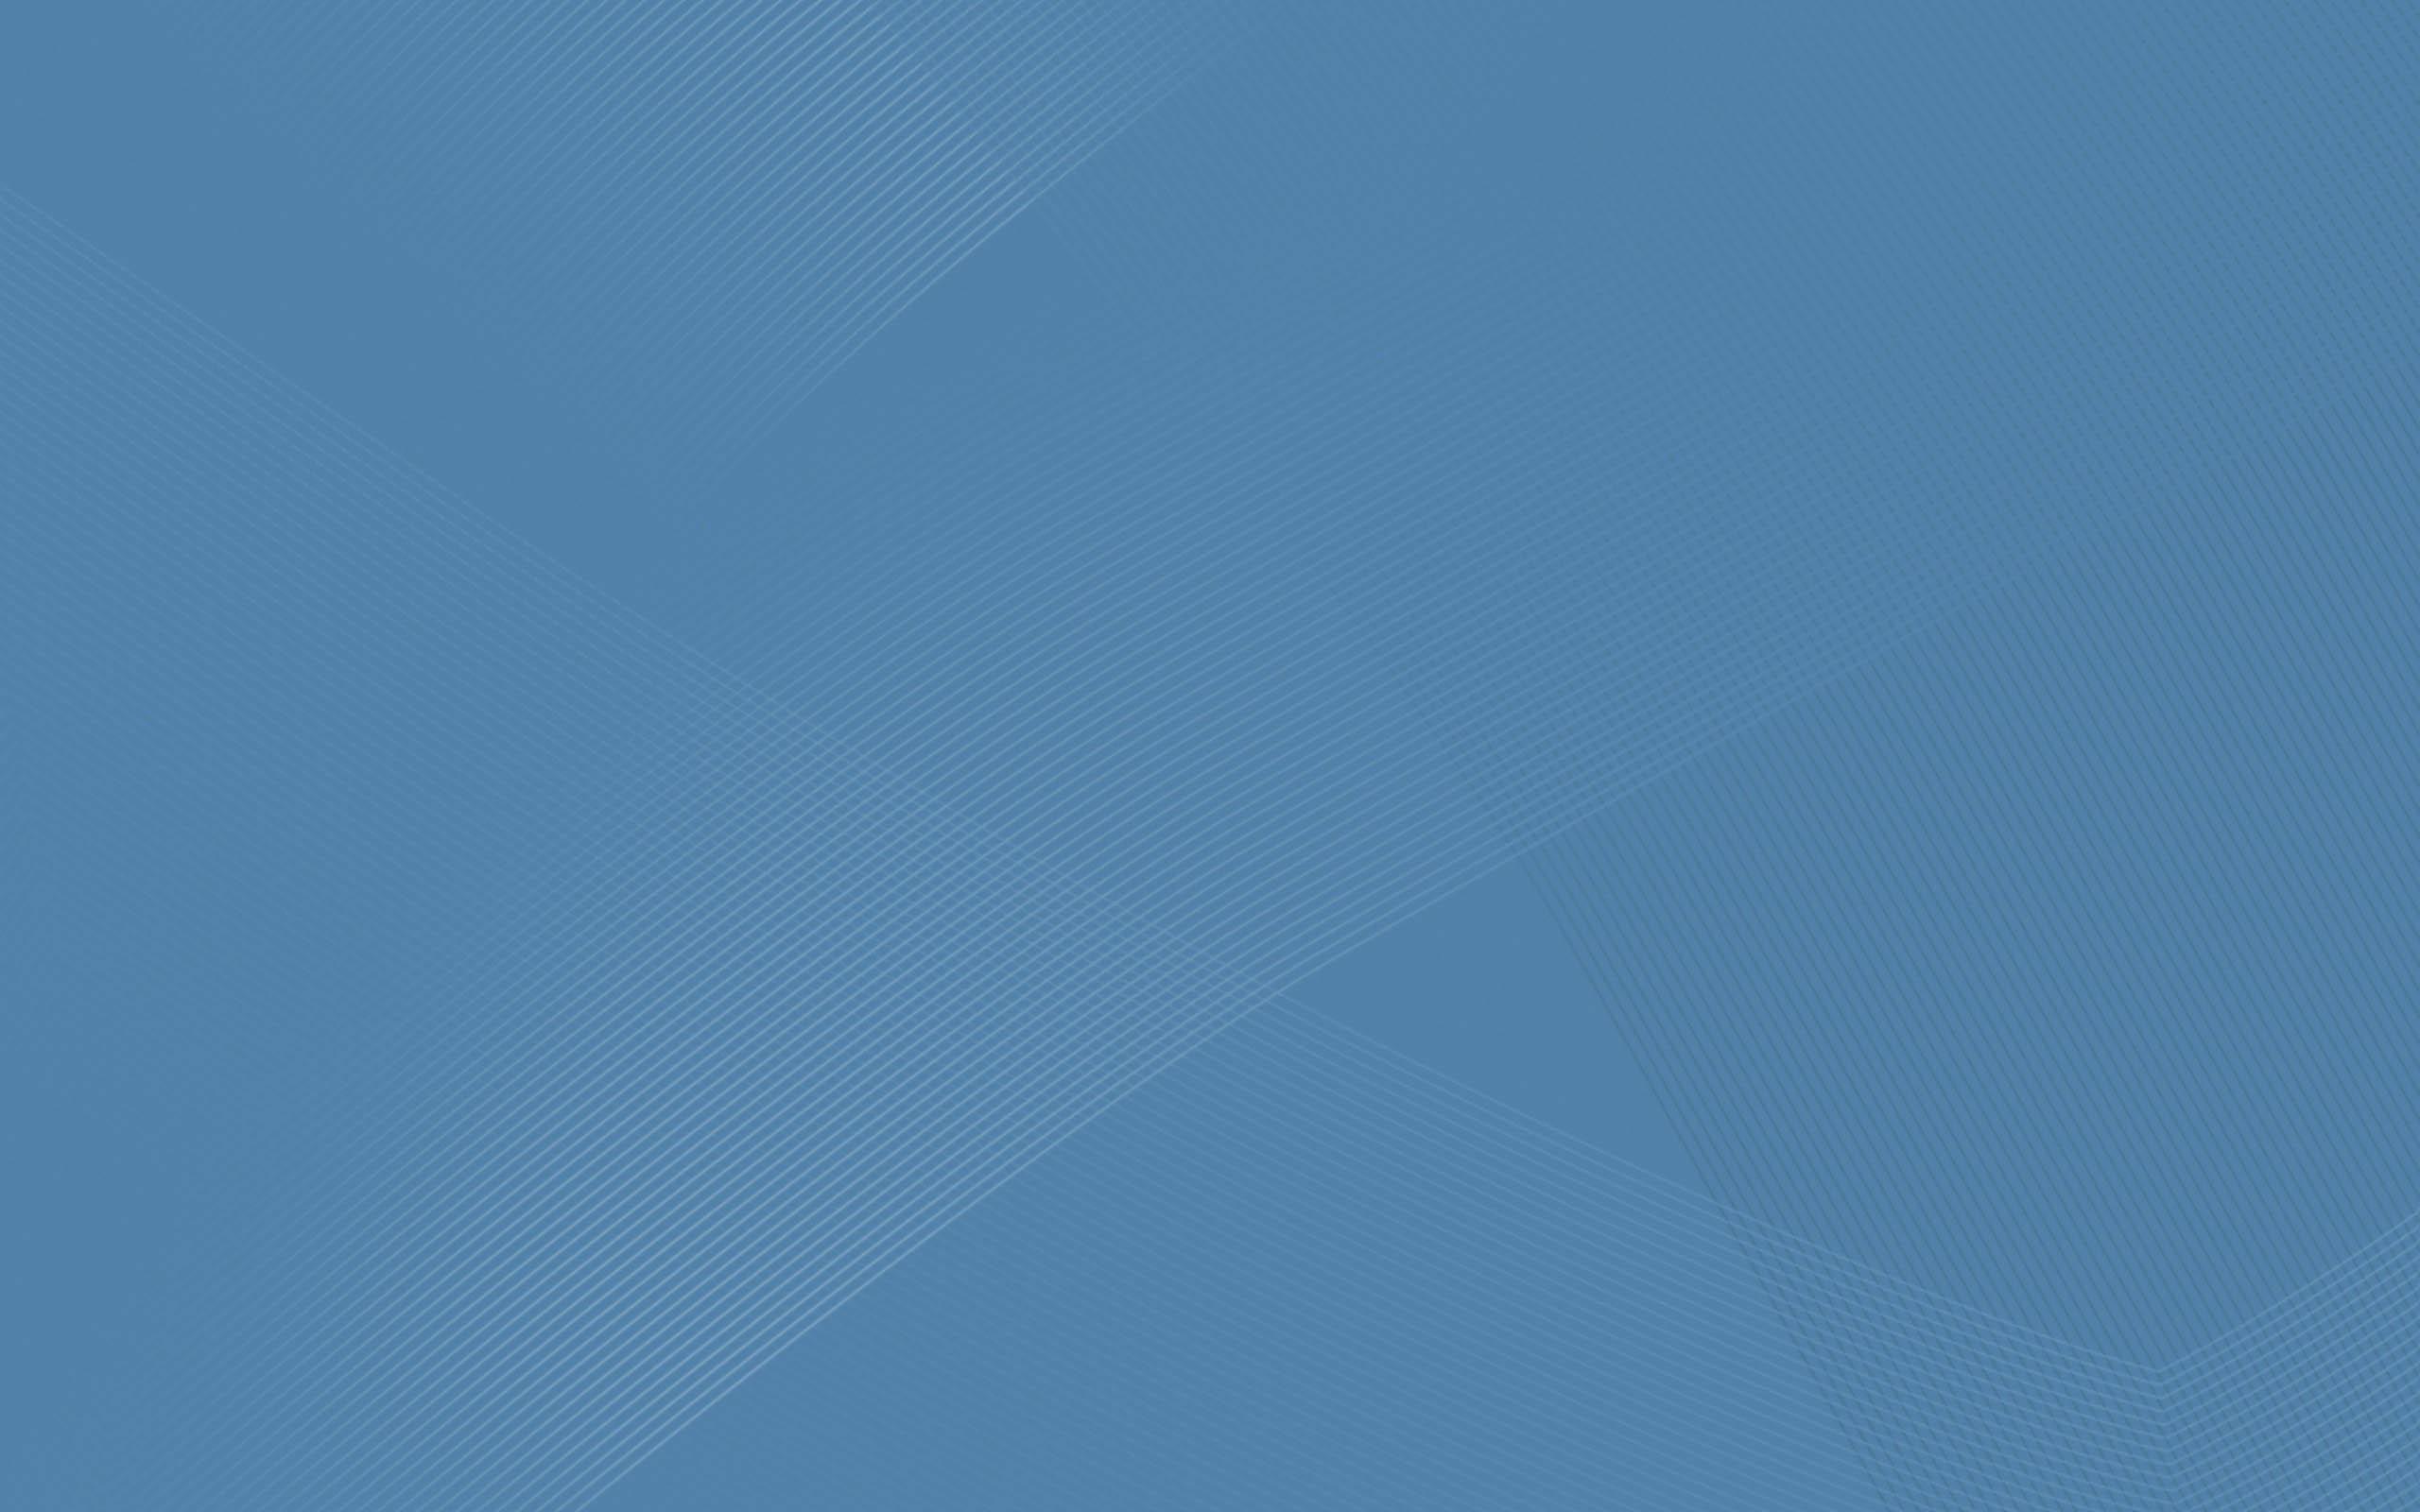 blue-lines-dark-minimalist